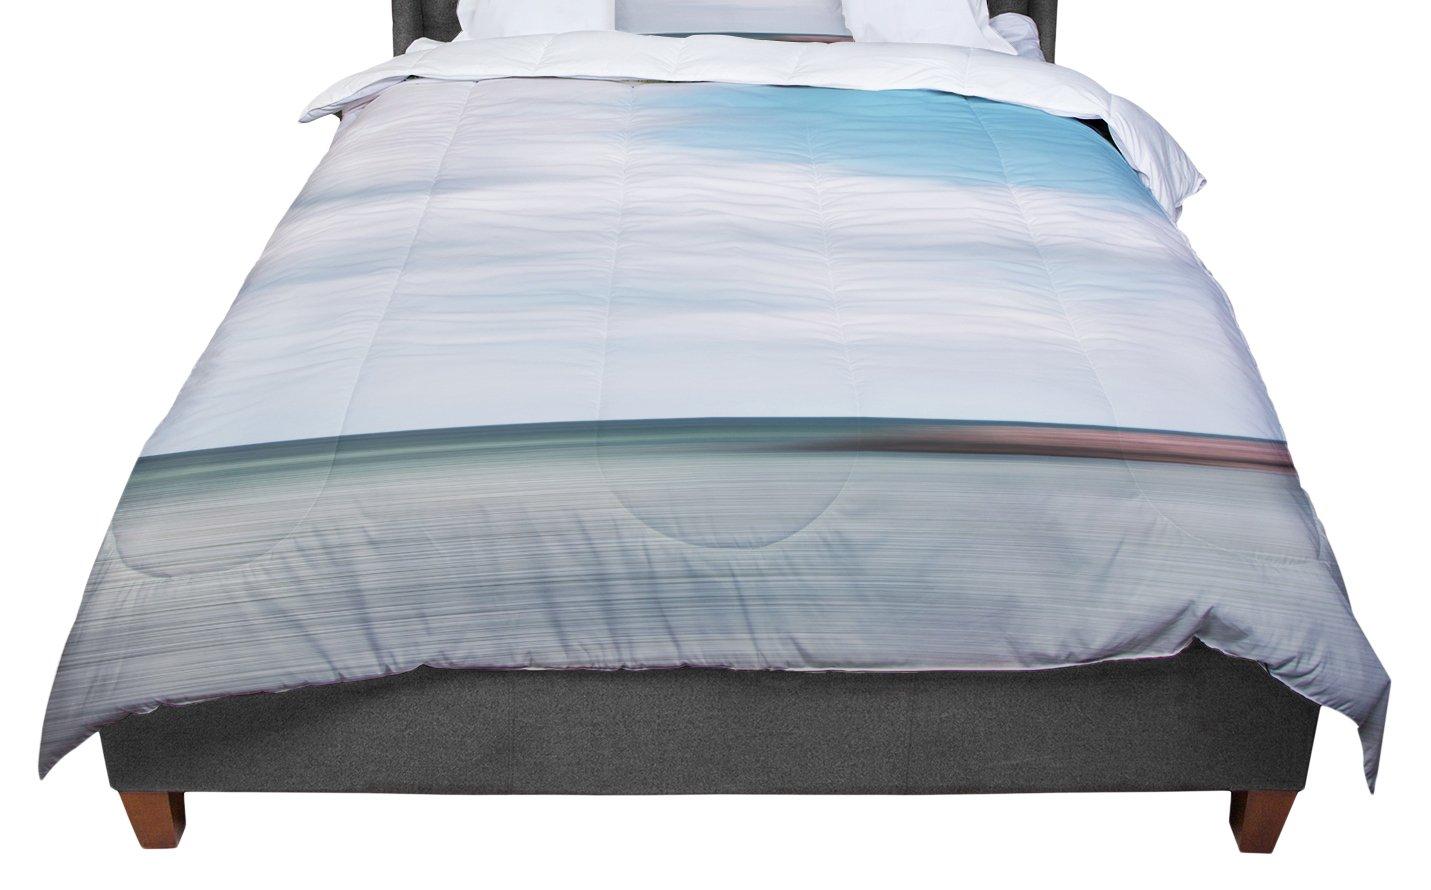 KESS InHouse Iris Lehnhardt 'June Beach' Gray Blue Twin Comforter, 68' X 88'